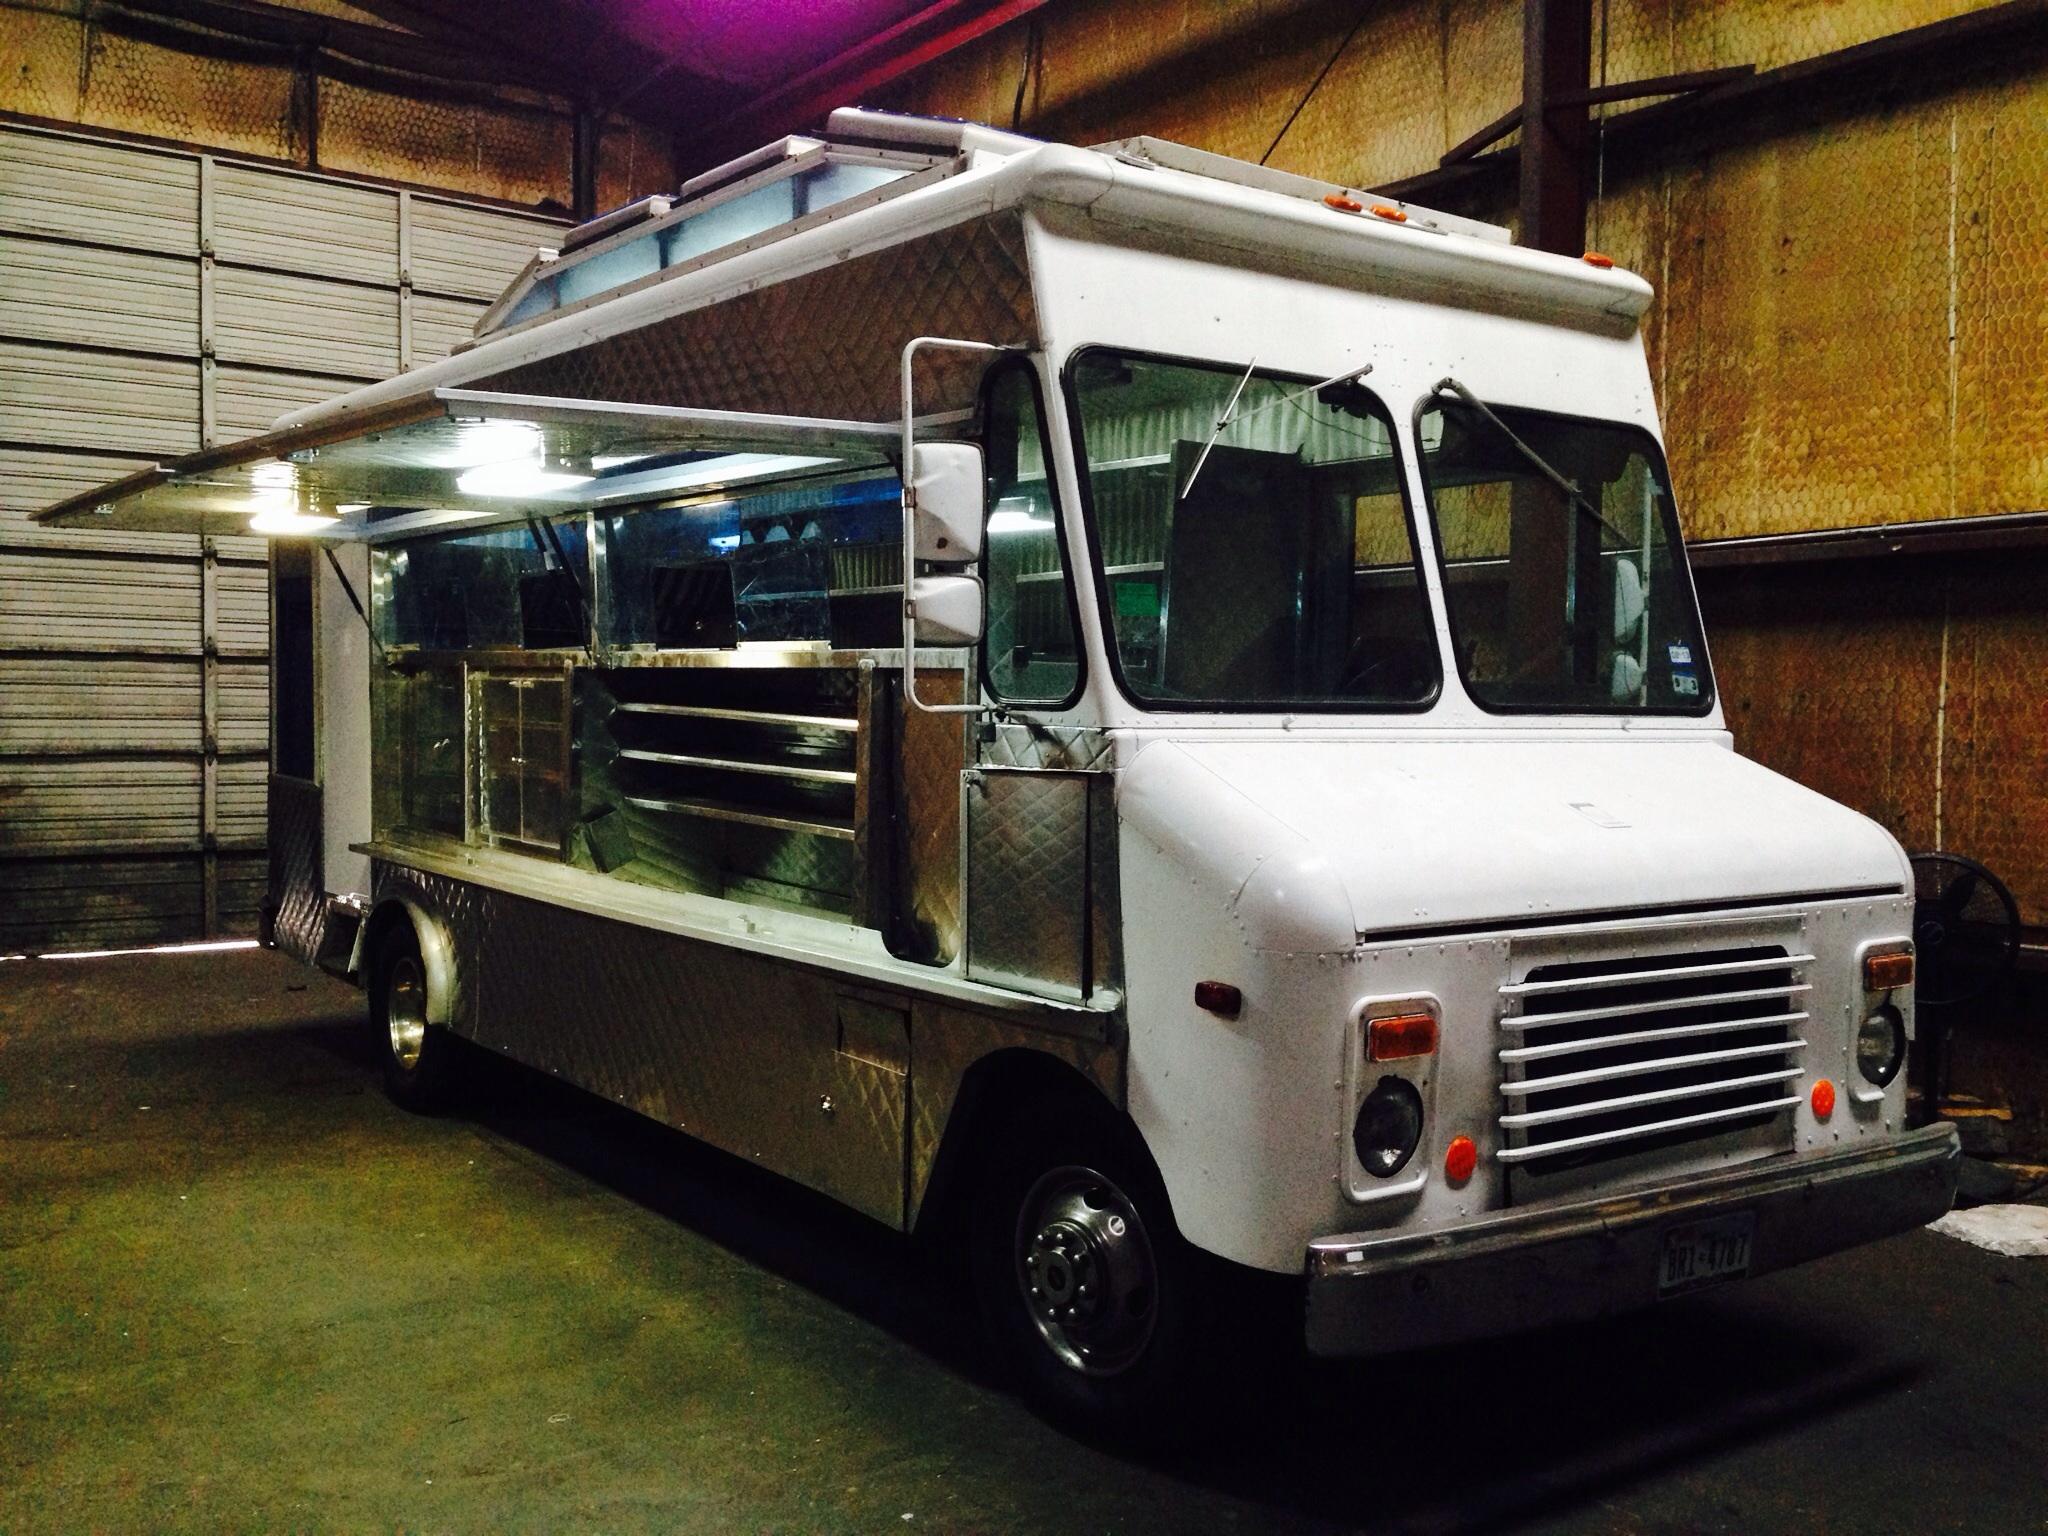 Stainless Steel Food Truck Serving Window Ledge